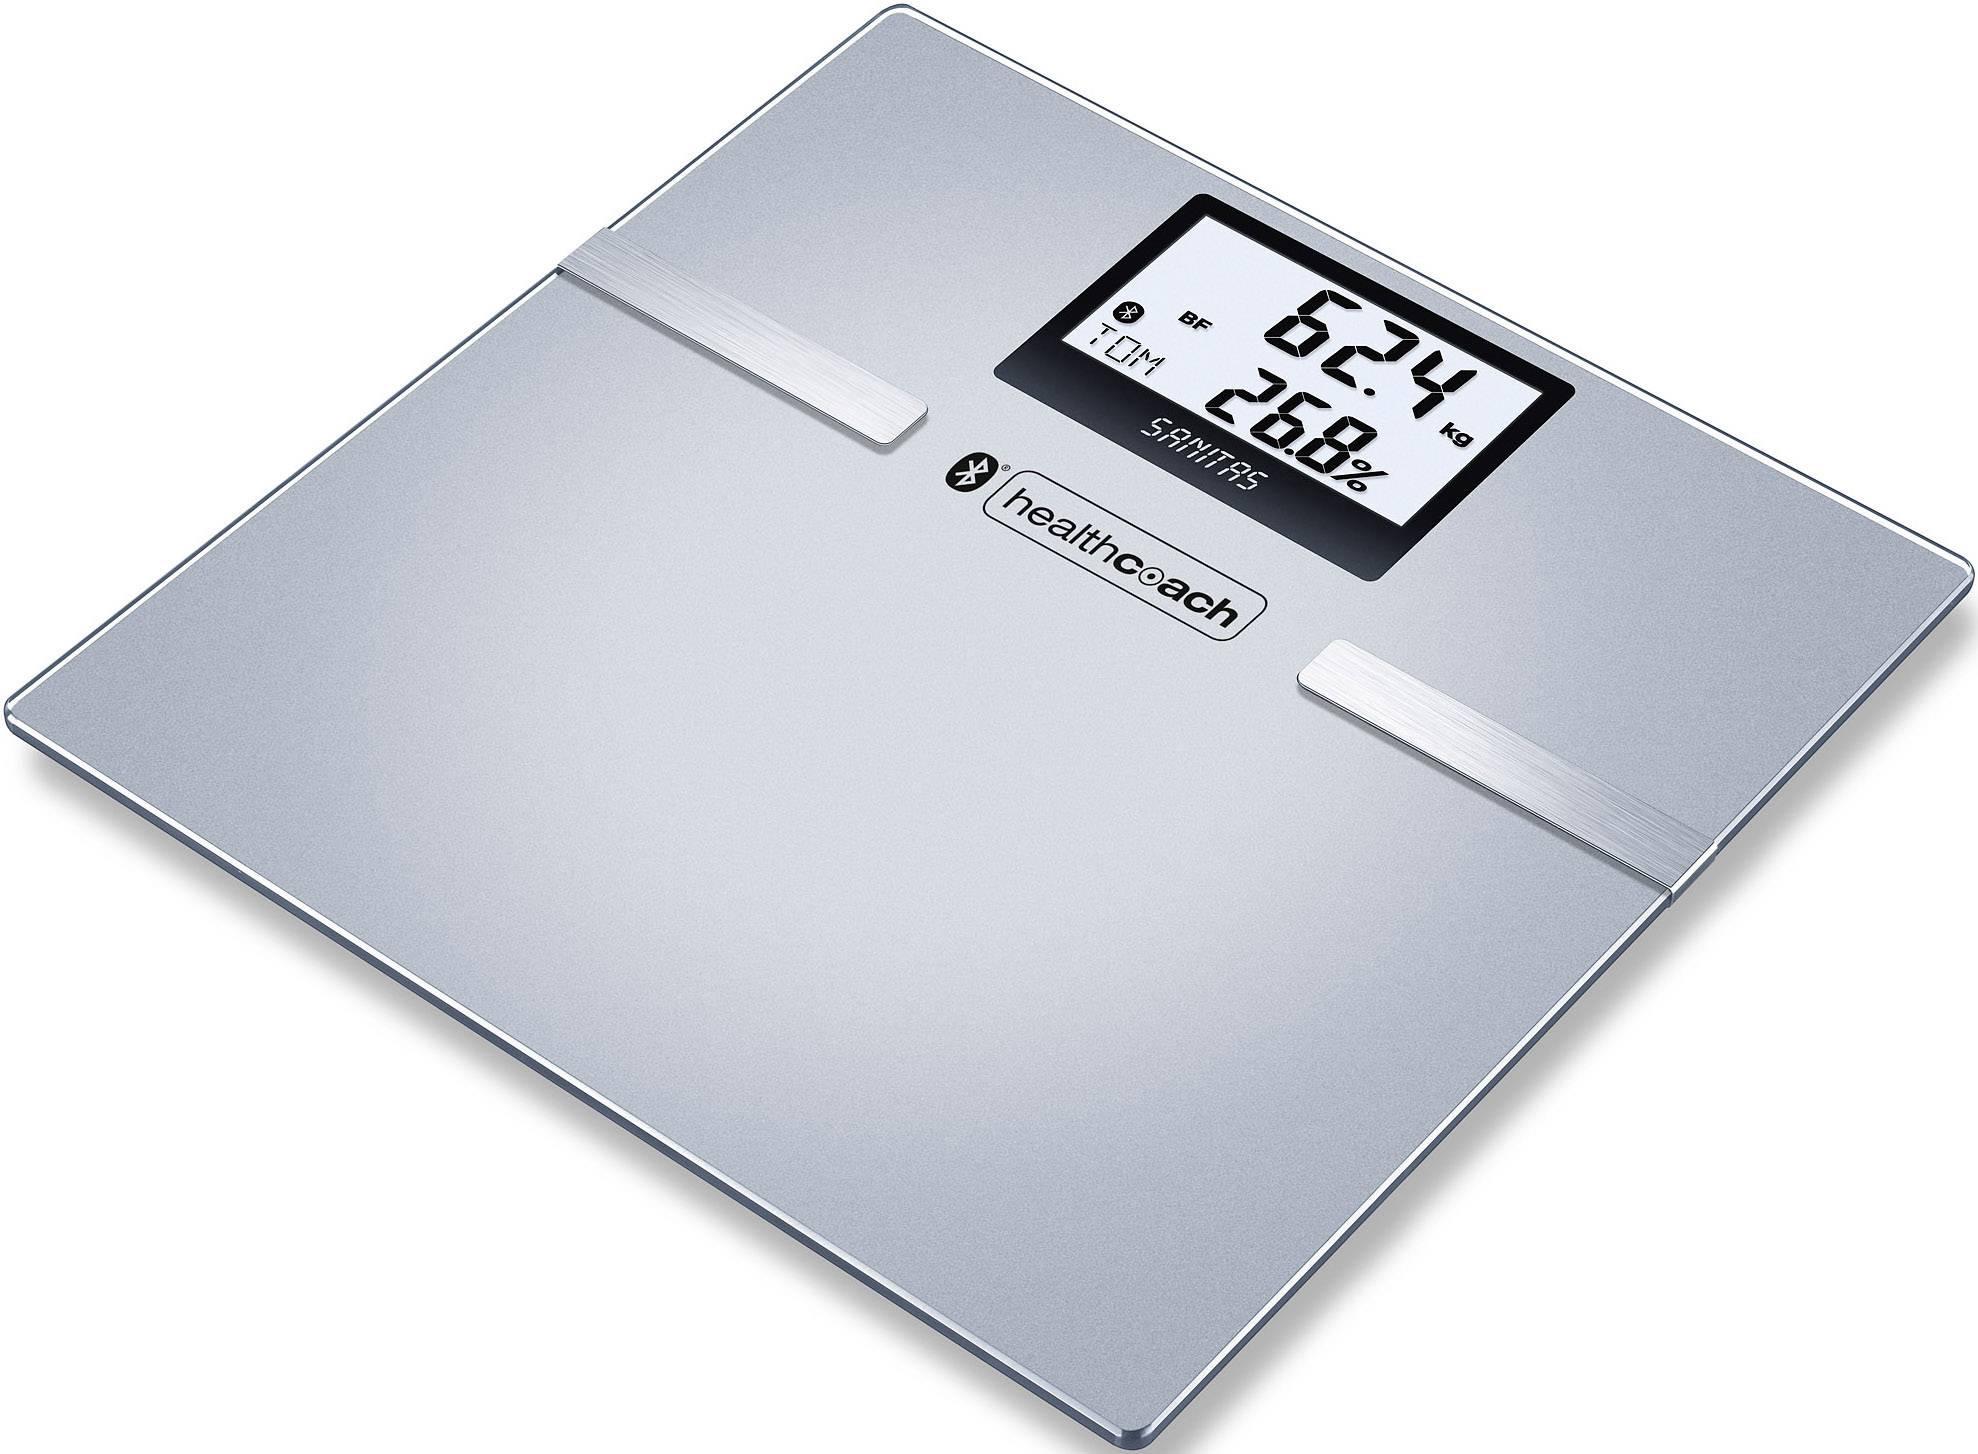 Váha s diagnostikou tělesných parametrů Sanitas SBF 70, šedá